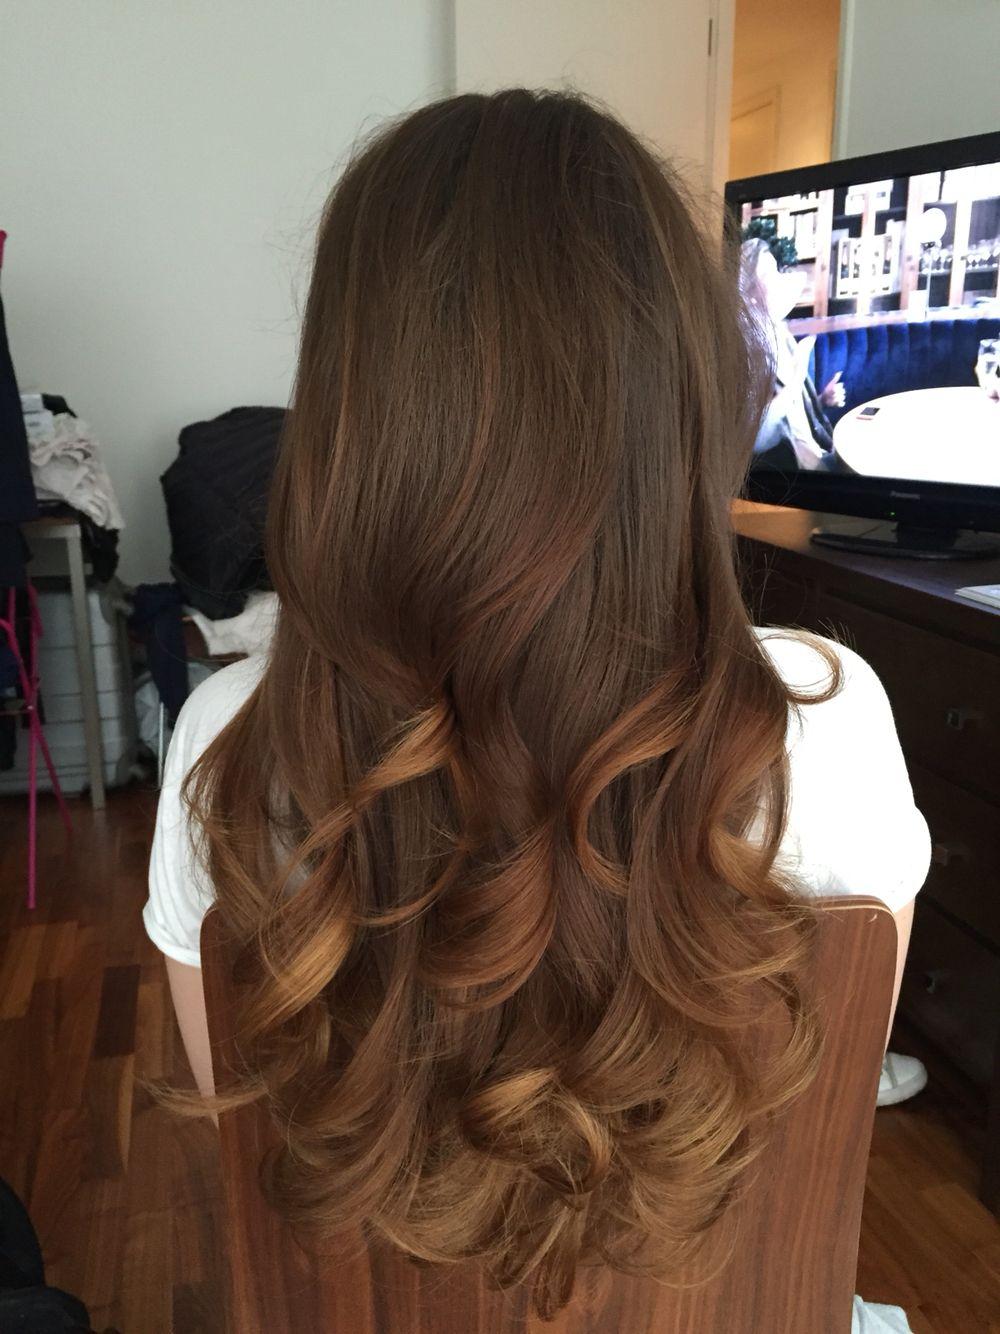 Instagram charloveshair Soft natural Blowdry hair